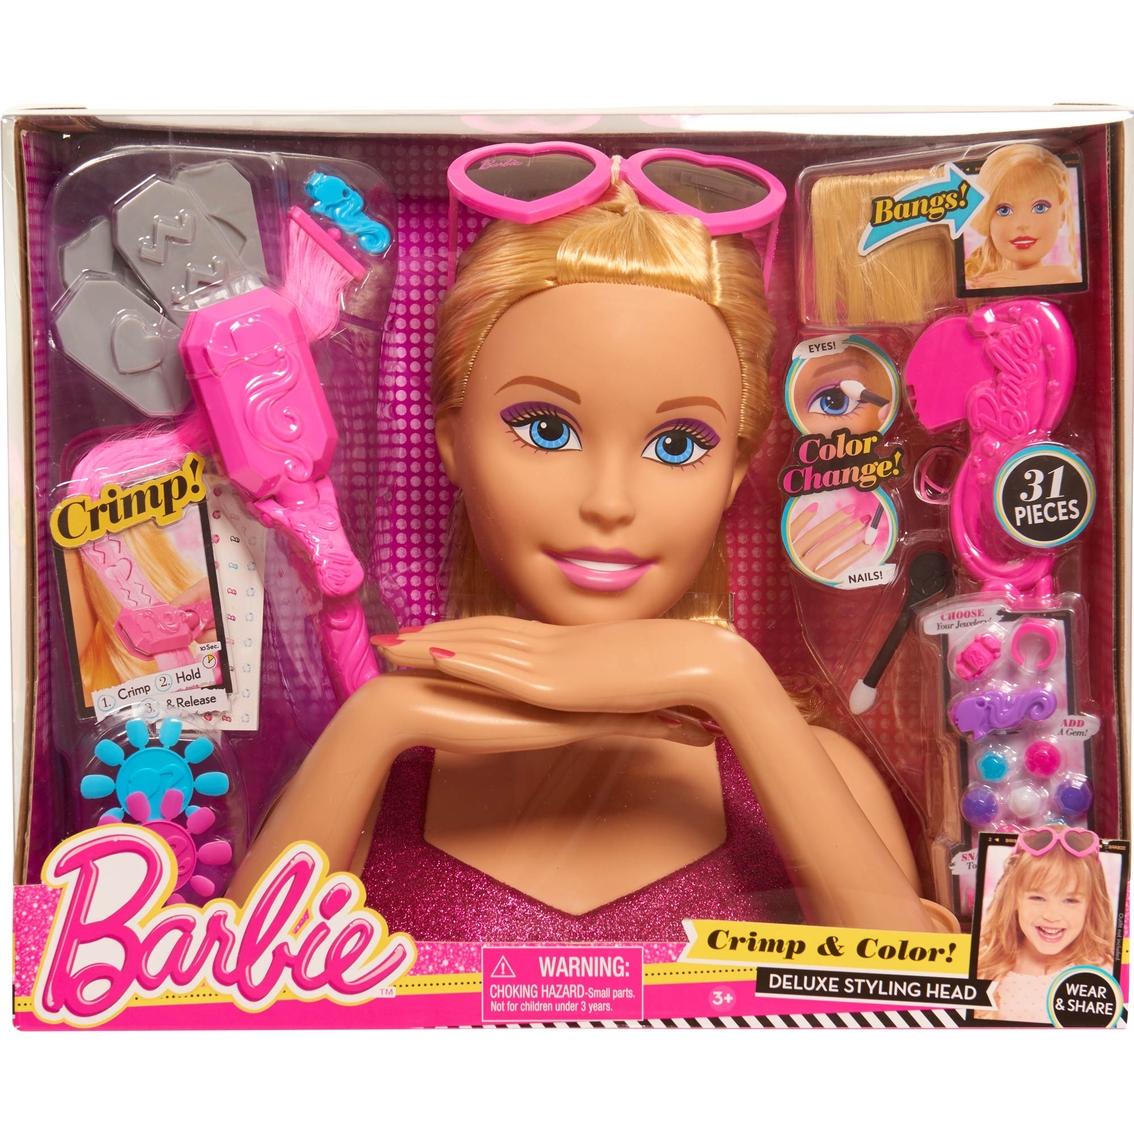 6pcs Random Mattel Barbie Styling Makeup Head Multi Colored Hair Girl Toys